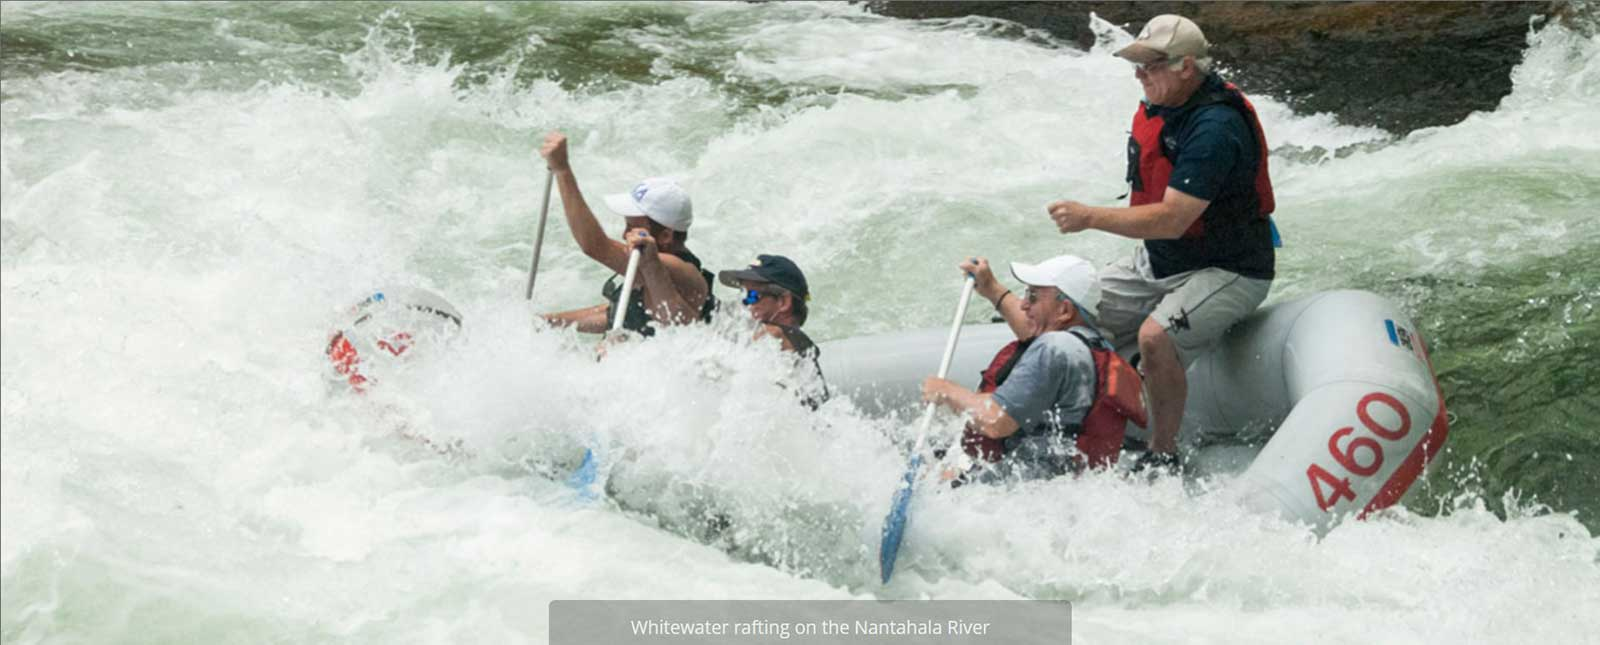 whitewate-rafting-nantahala-river